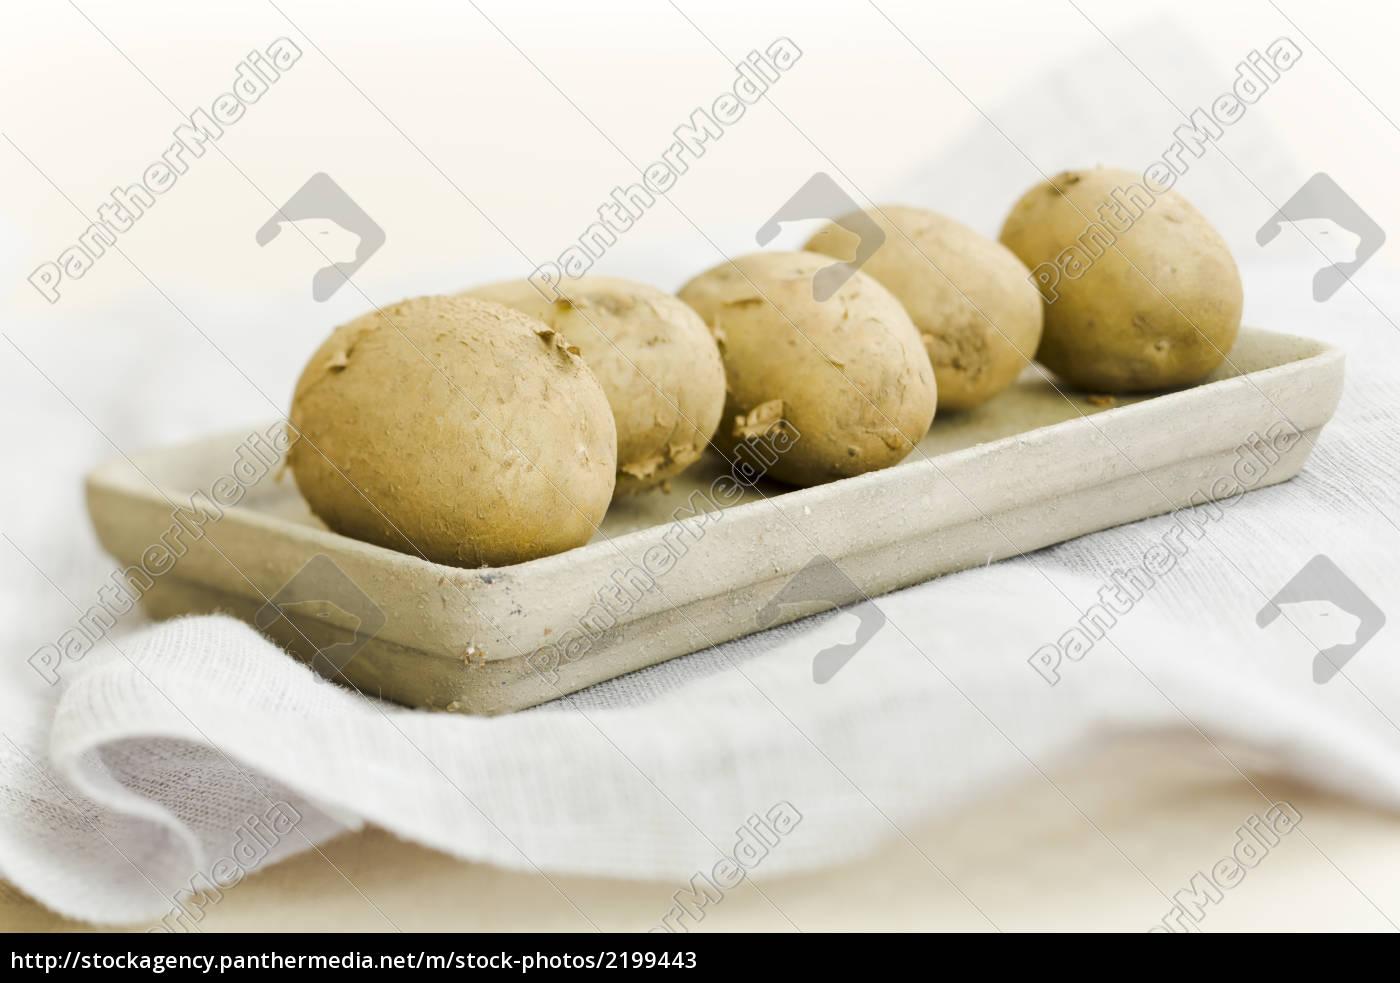 five, raw, potatoes - 2199443